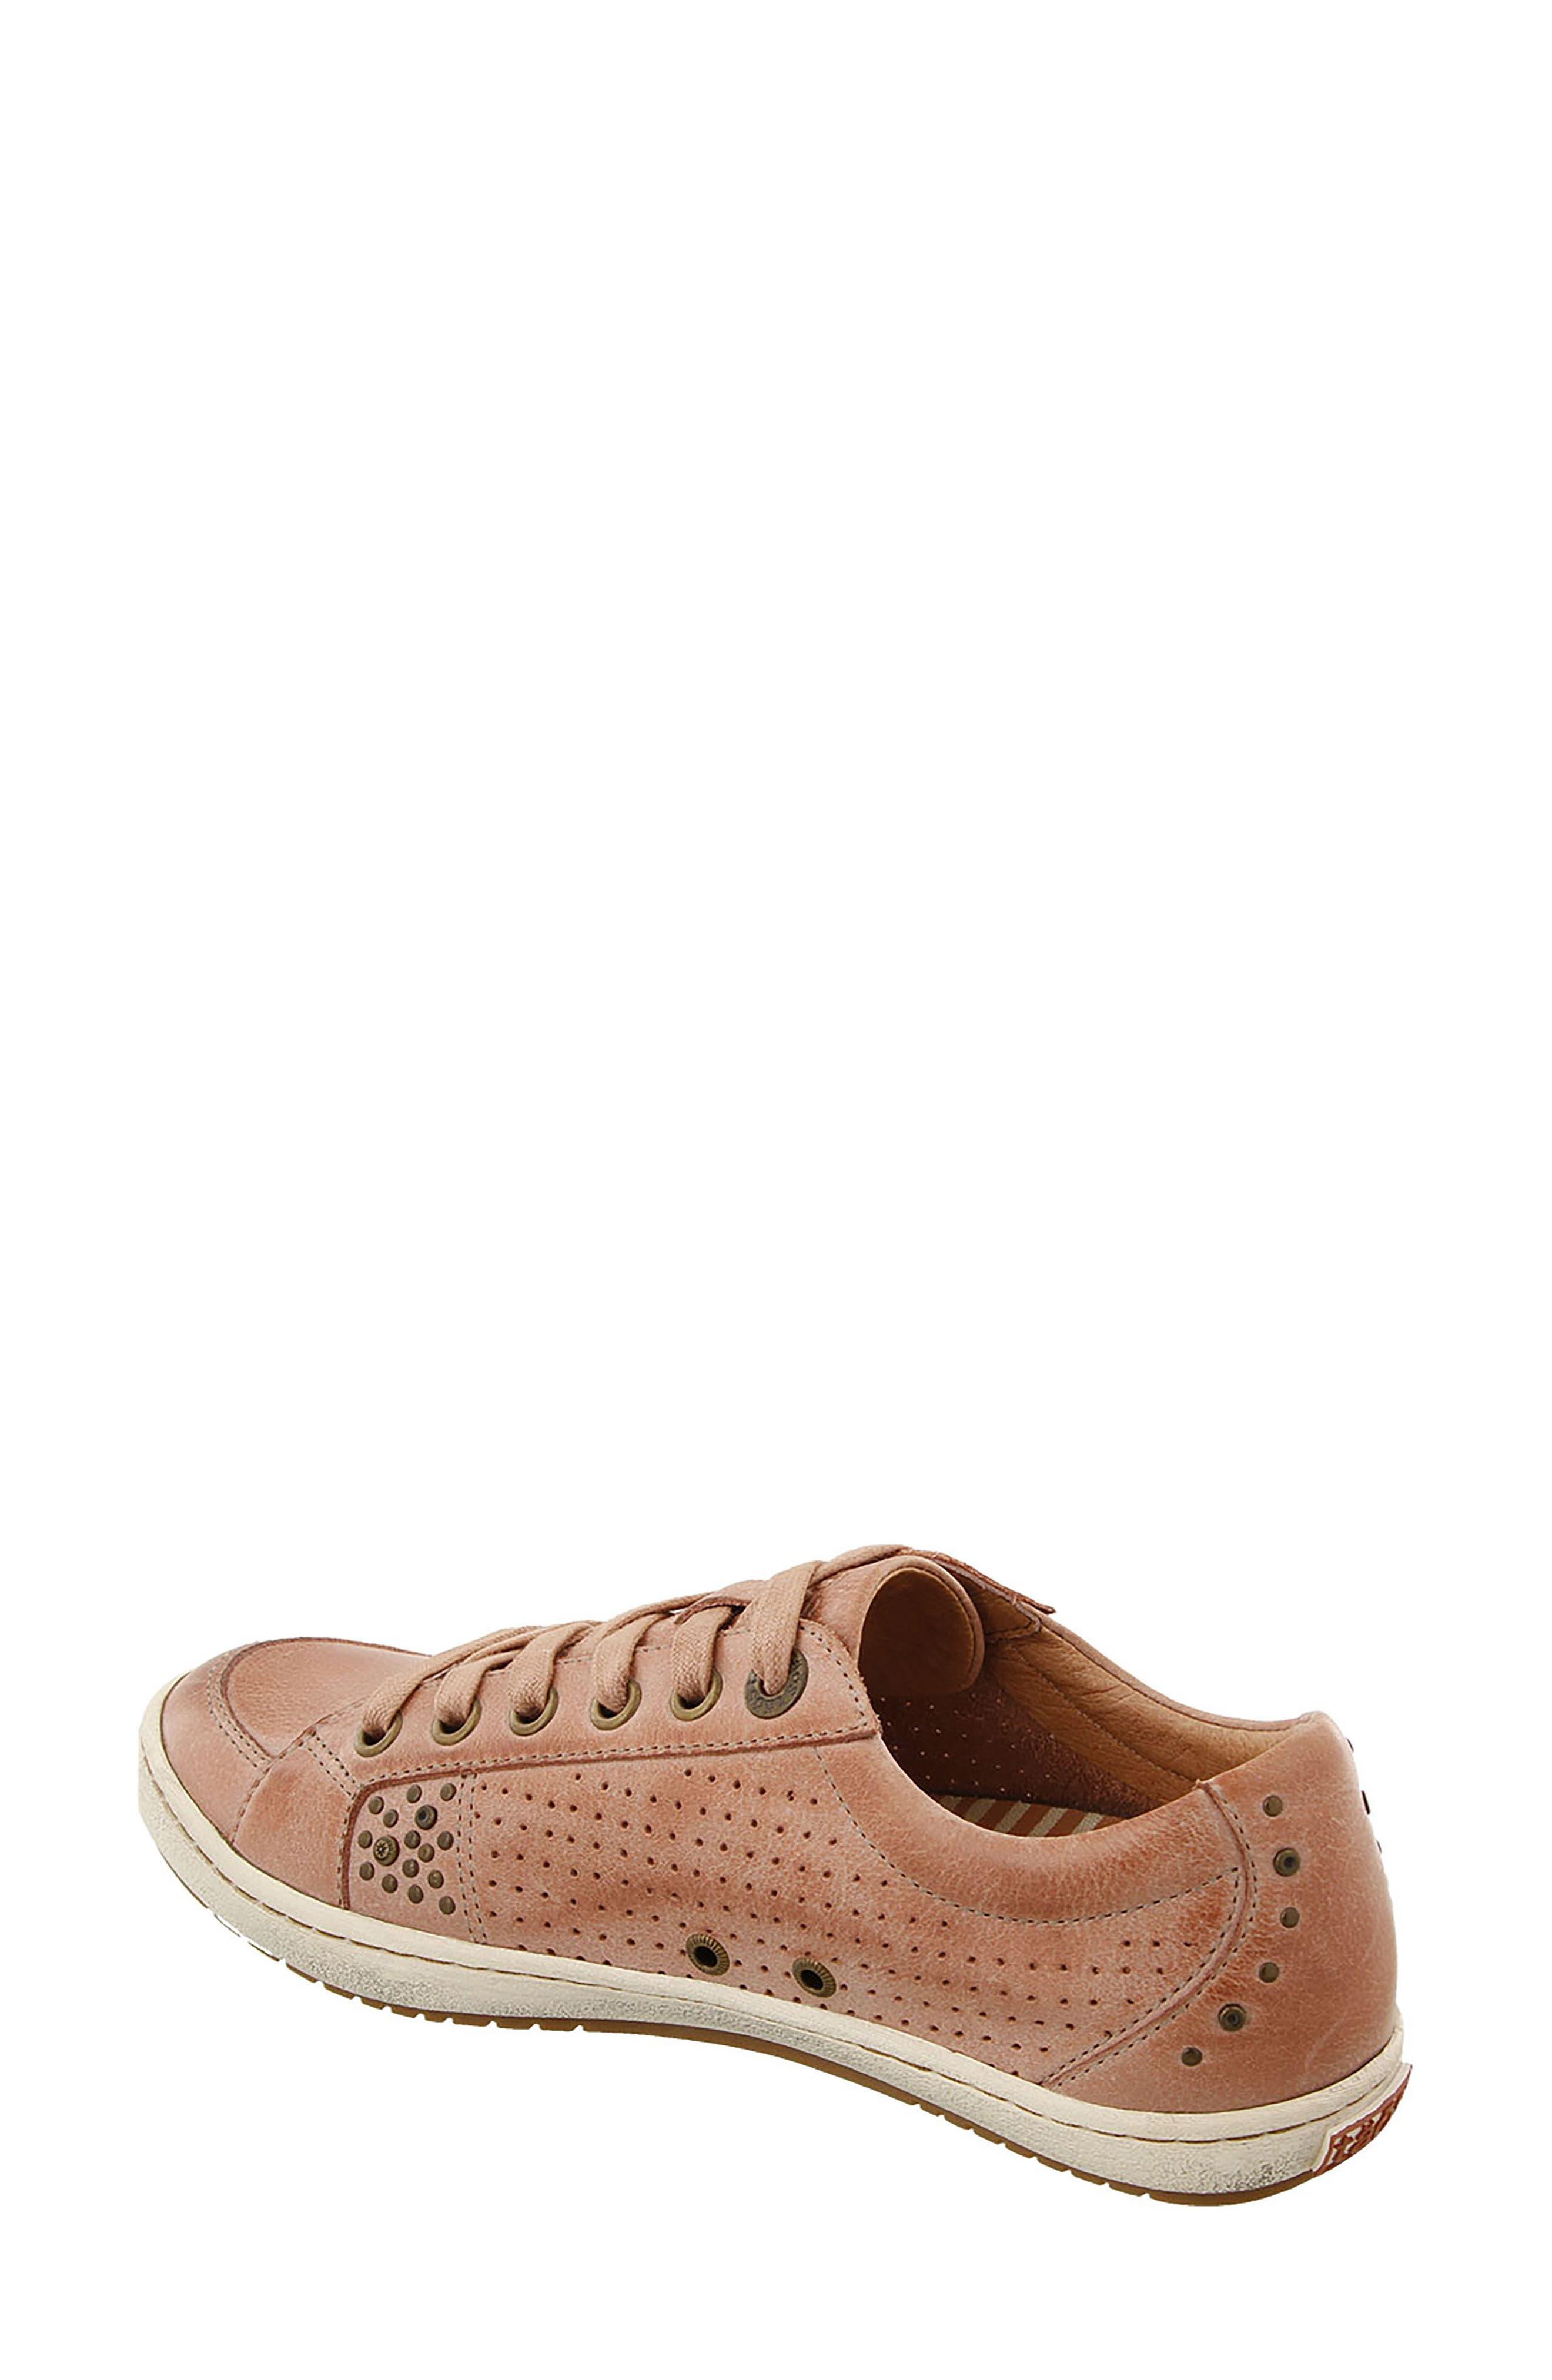 'Freedom' Sneaker,                             Alternate thumbnail 2, color,                             Blush Leather